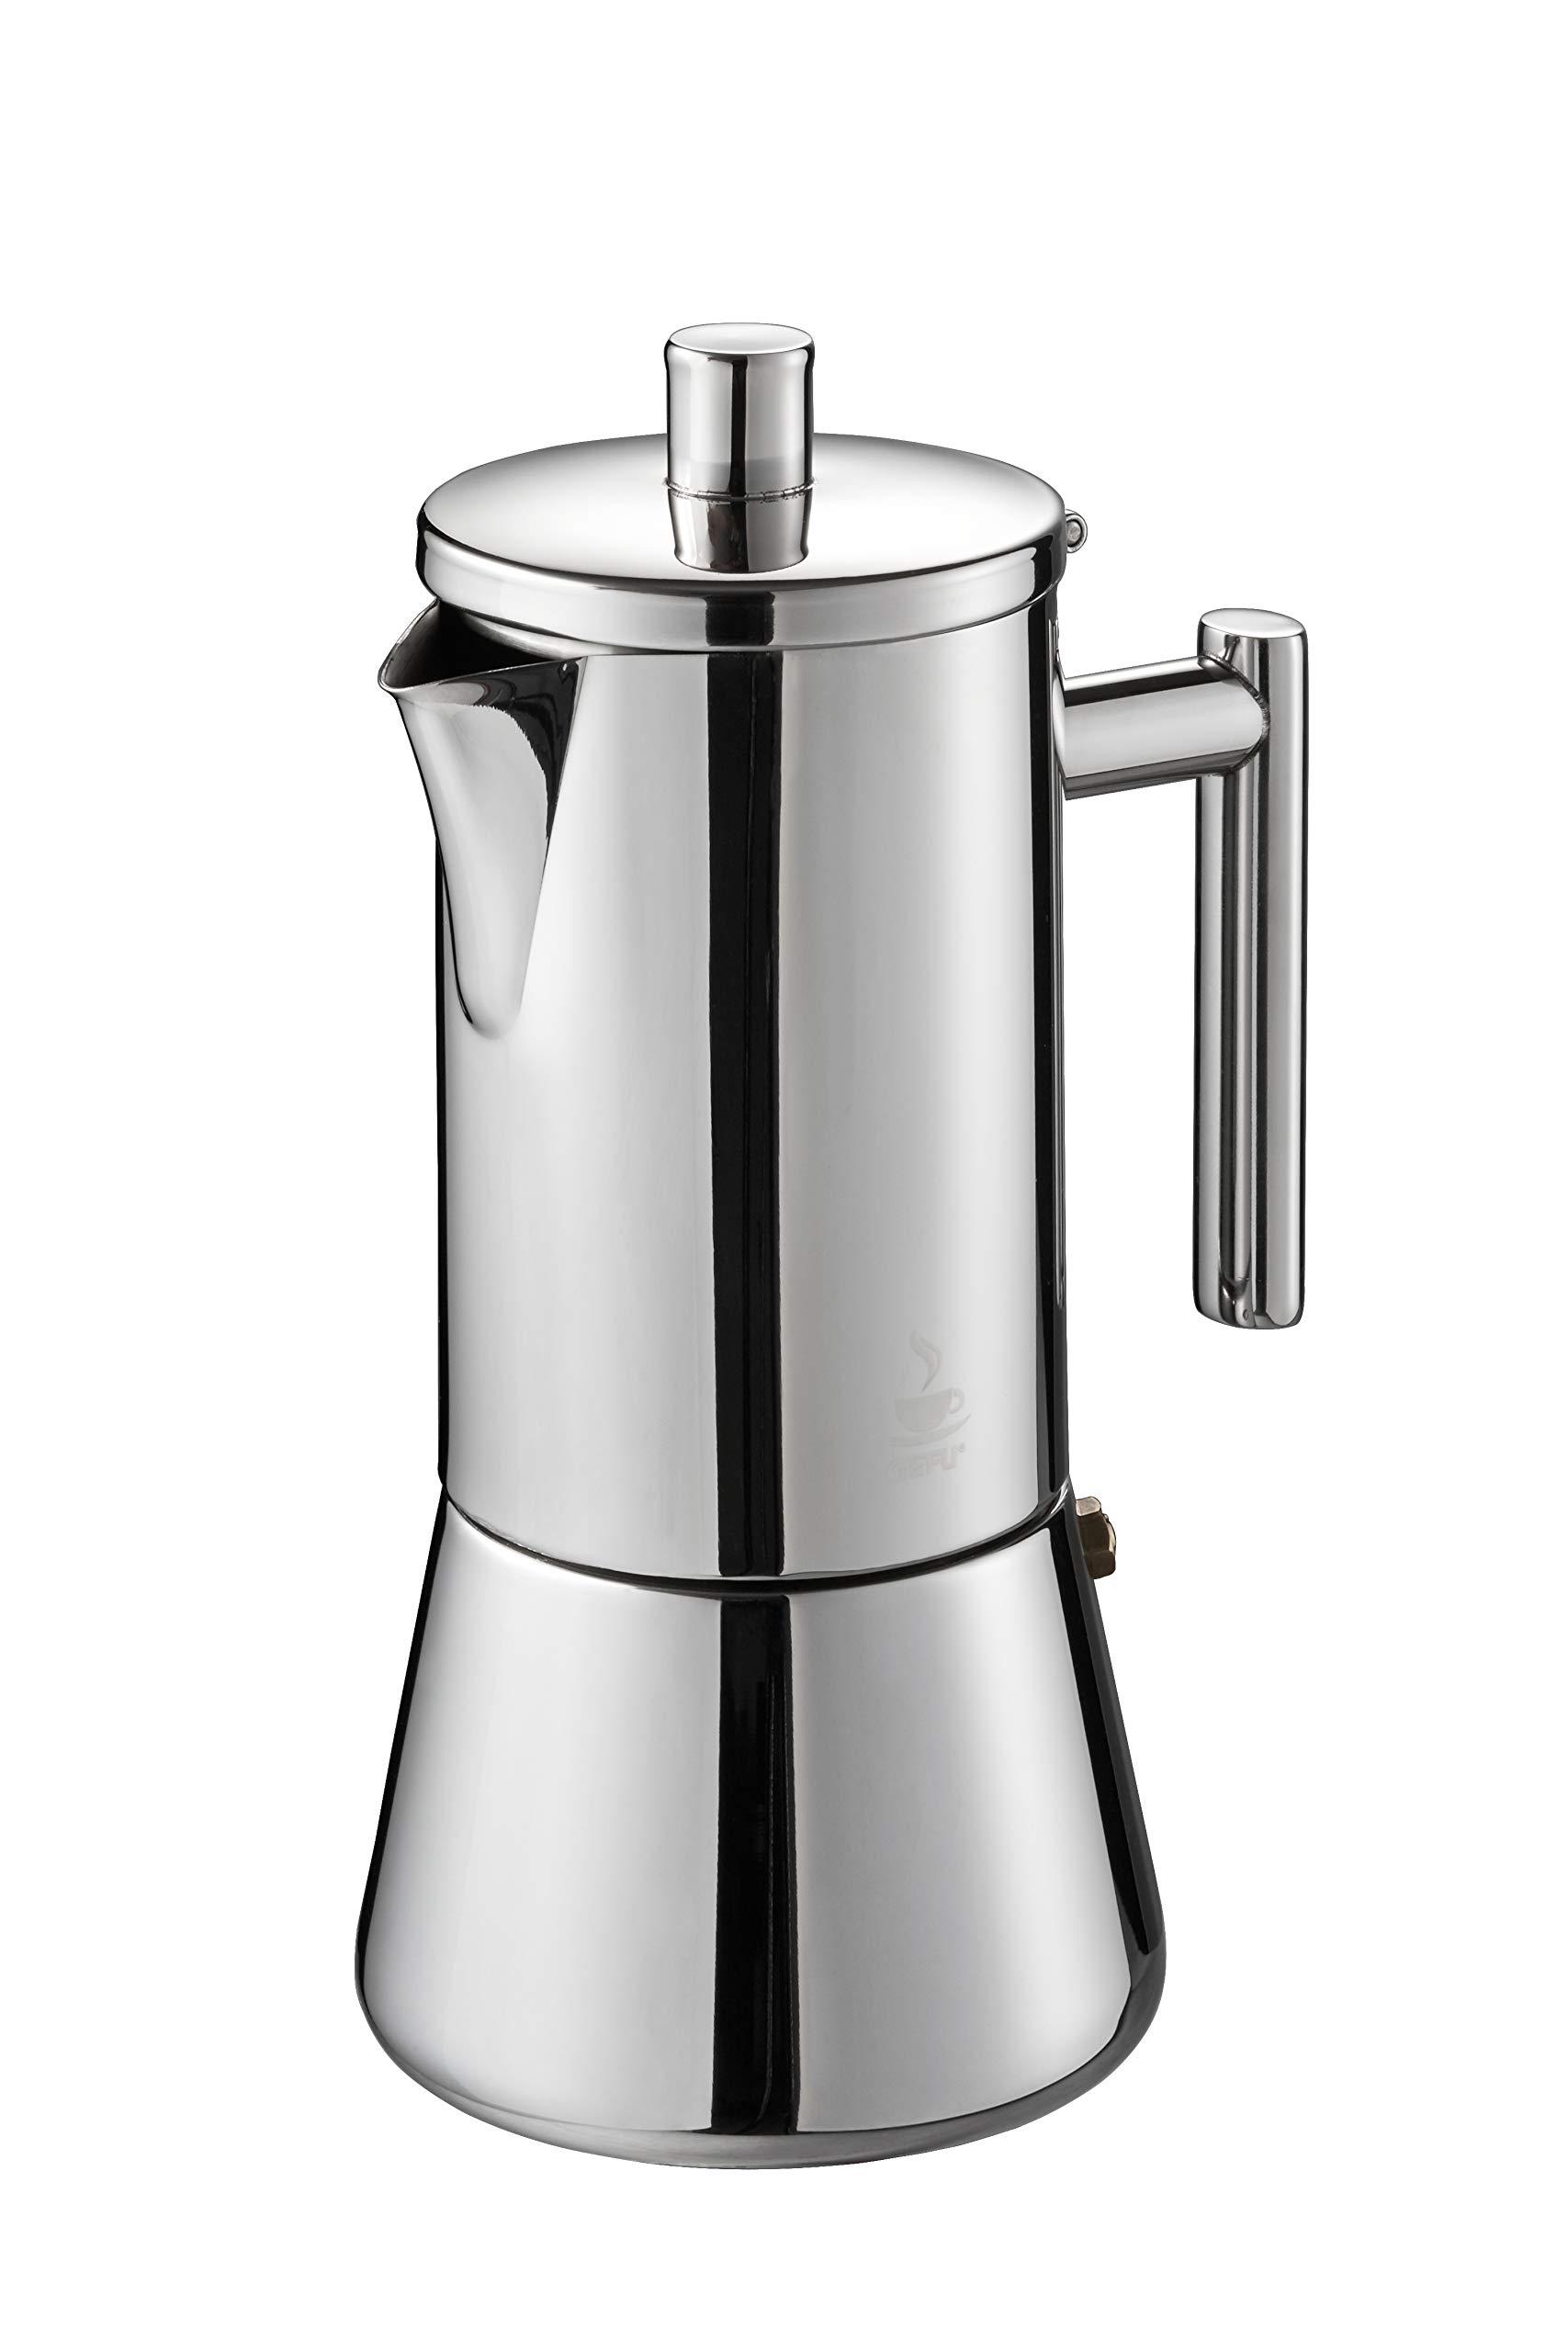 GEFU Espresso Maker 4 Cups Nando